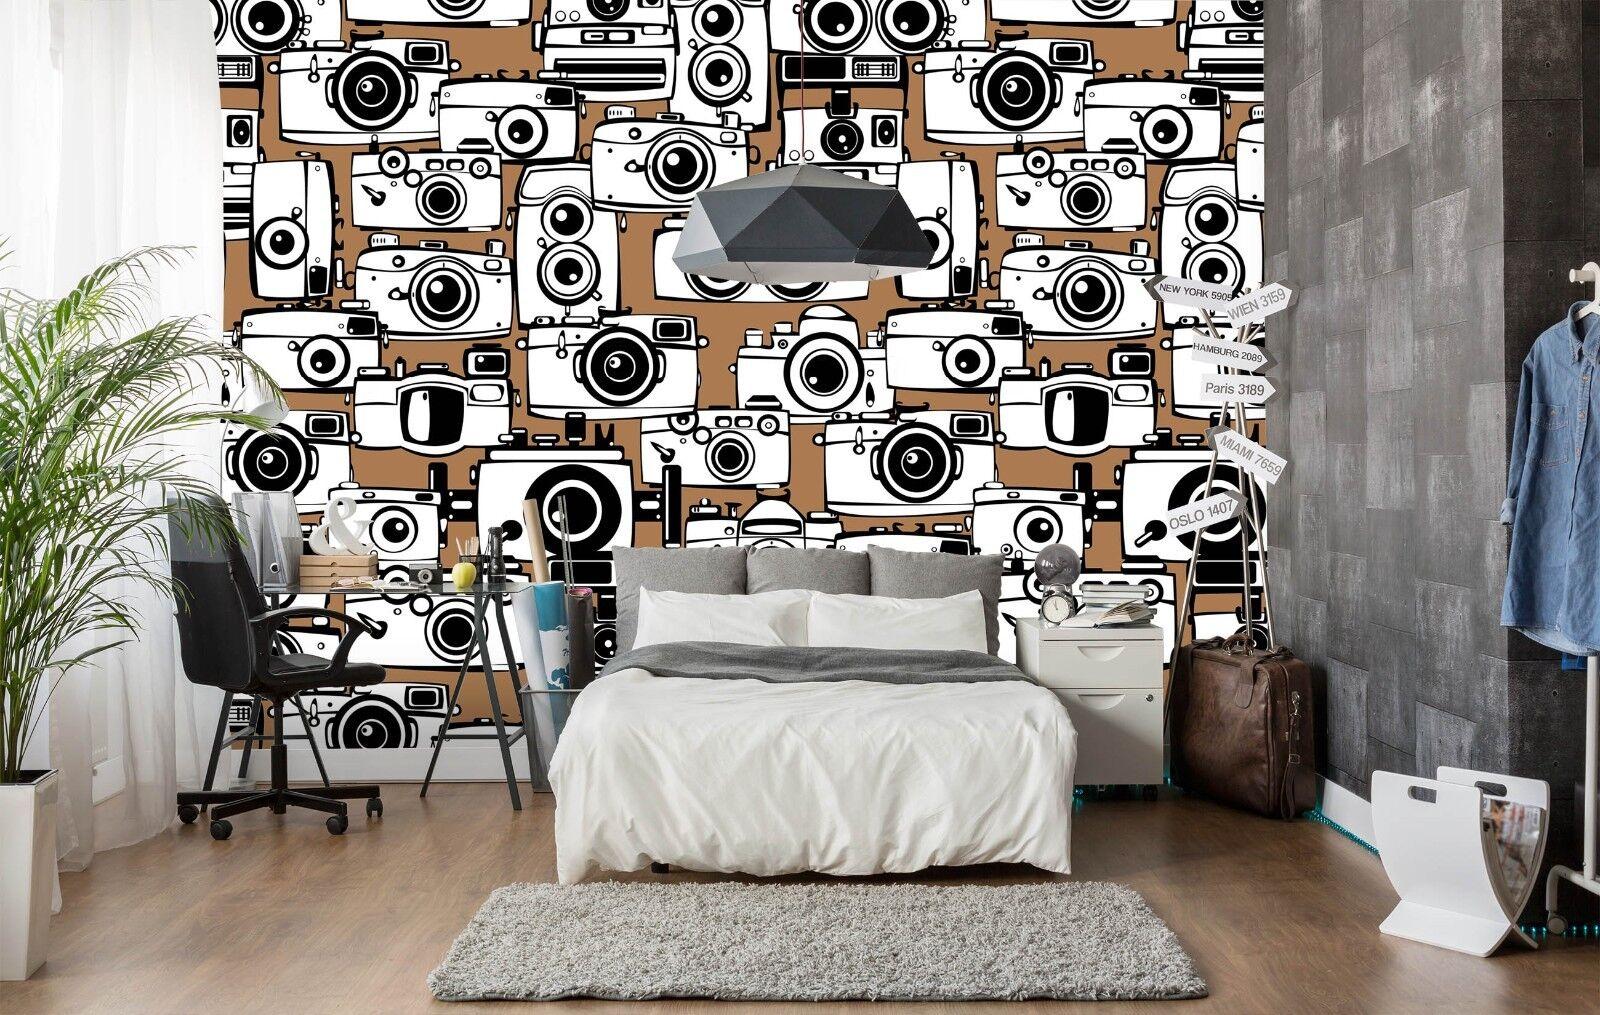 3D Weiß Cartoon Camera 97 Wallpaper Mural Paper Wall Print Murals UK Lemon